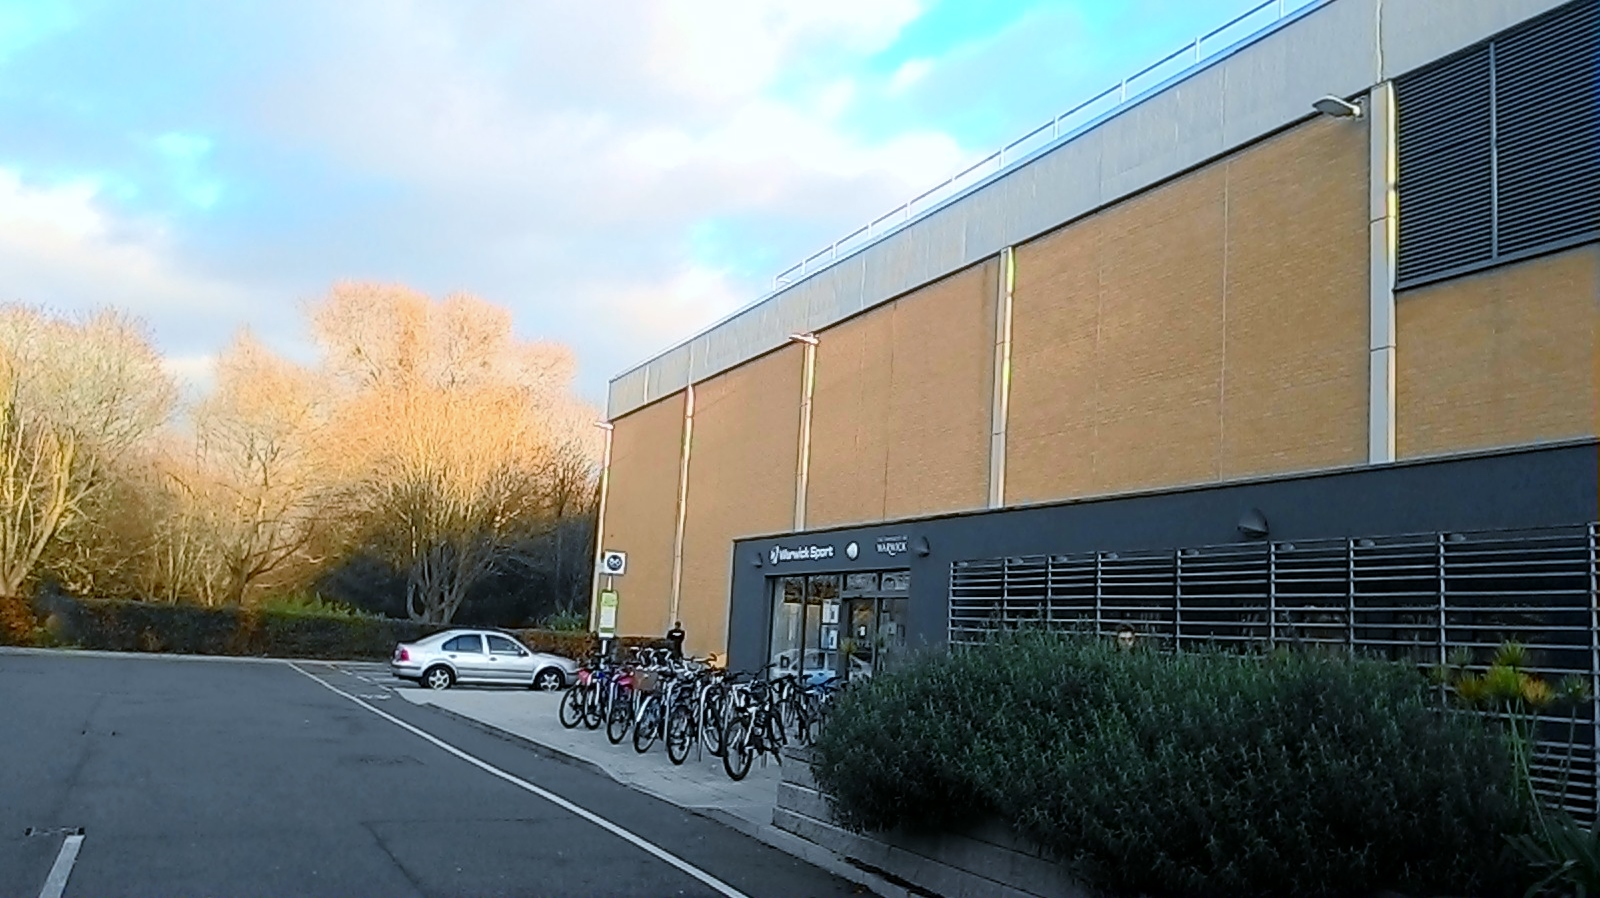 Gelama Busuk Cafe Library Warwick Uni